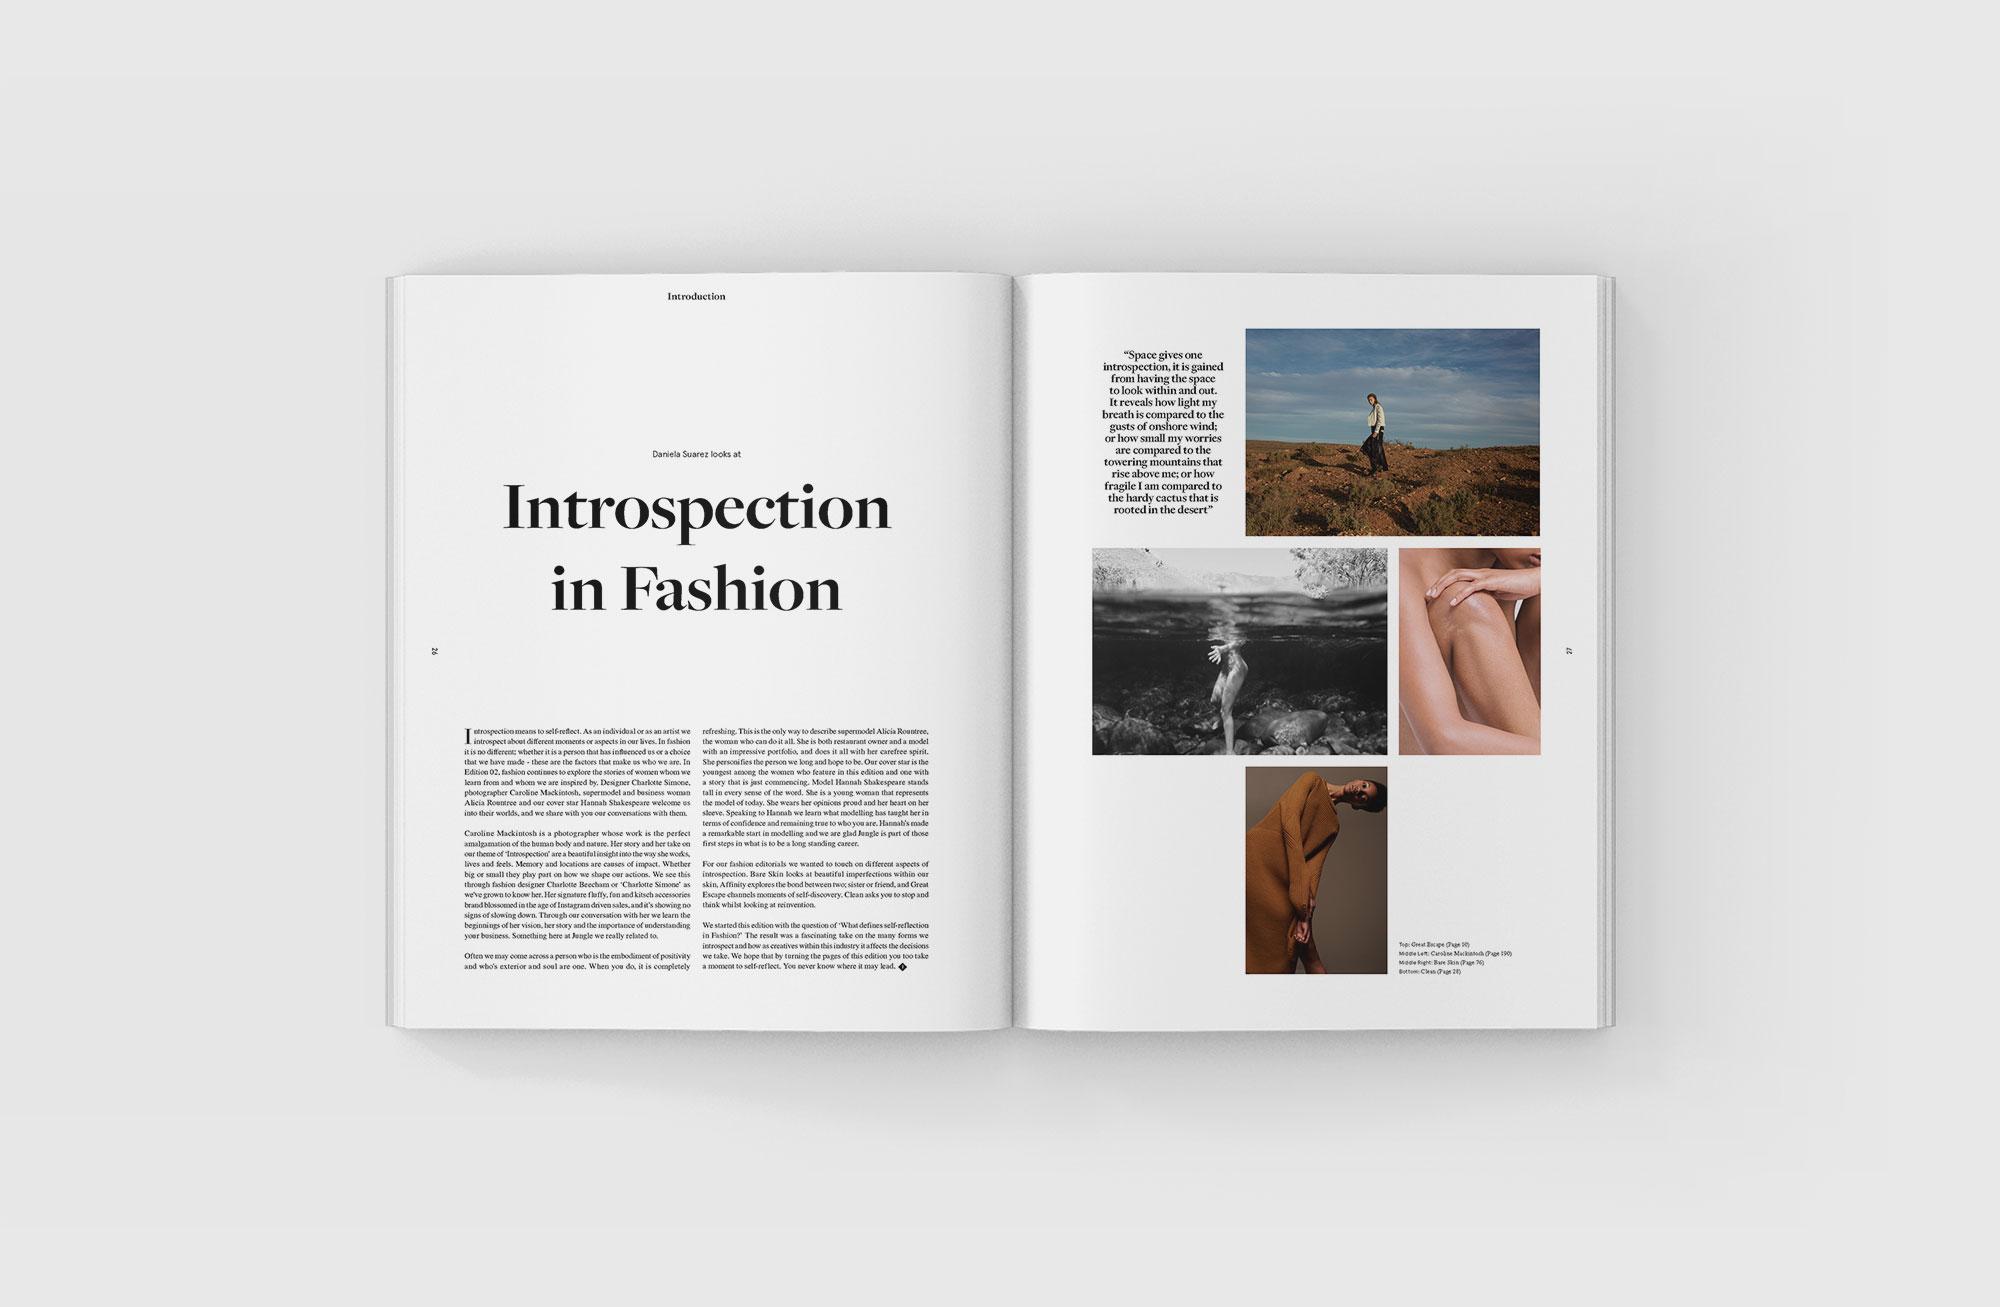 jungle-magazine-02-7.jpg